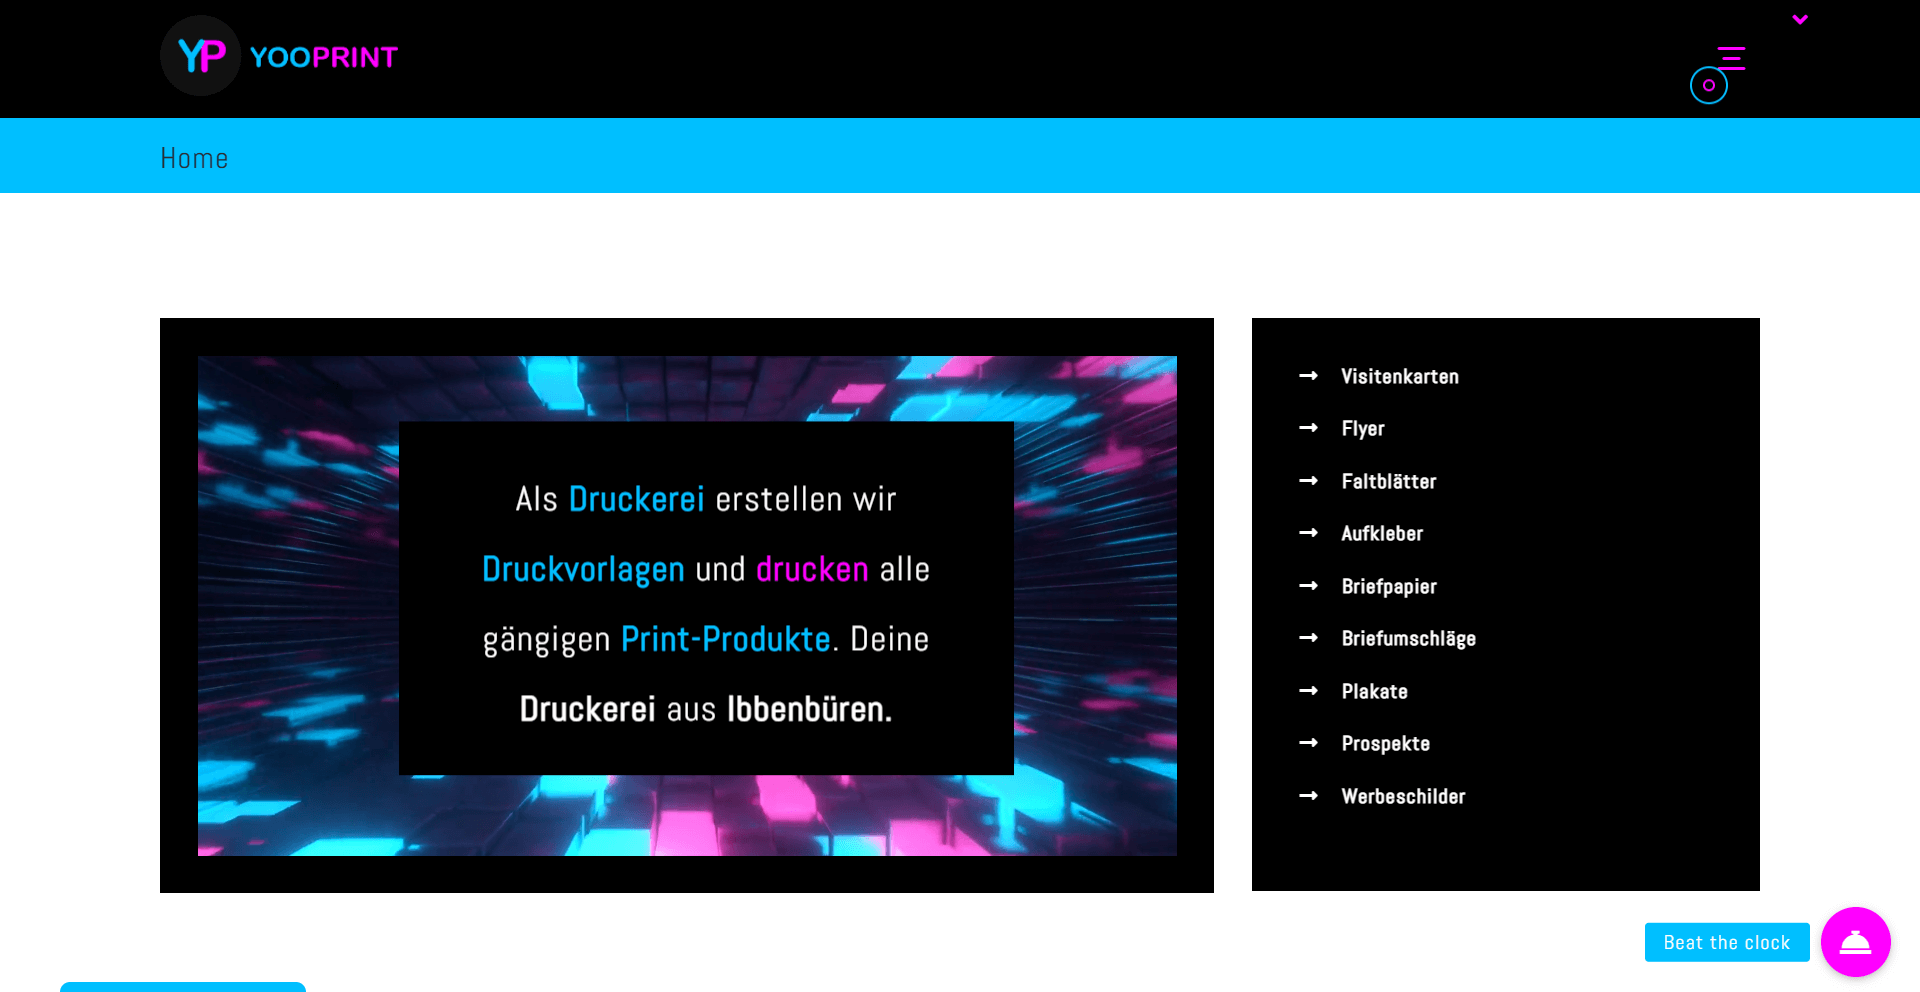 YOOPRINT Druckerei, WordPress Webdesign Referenz